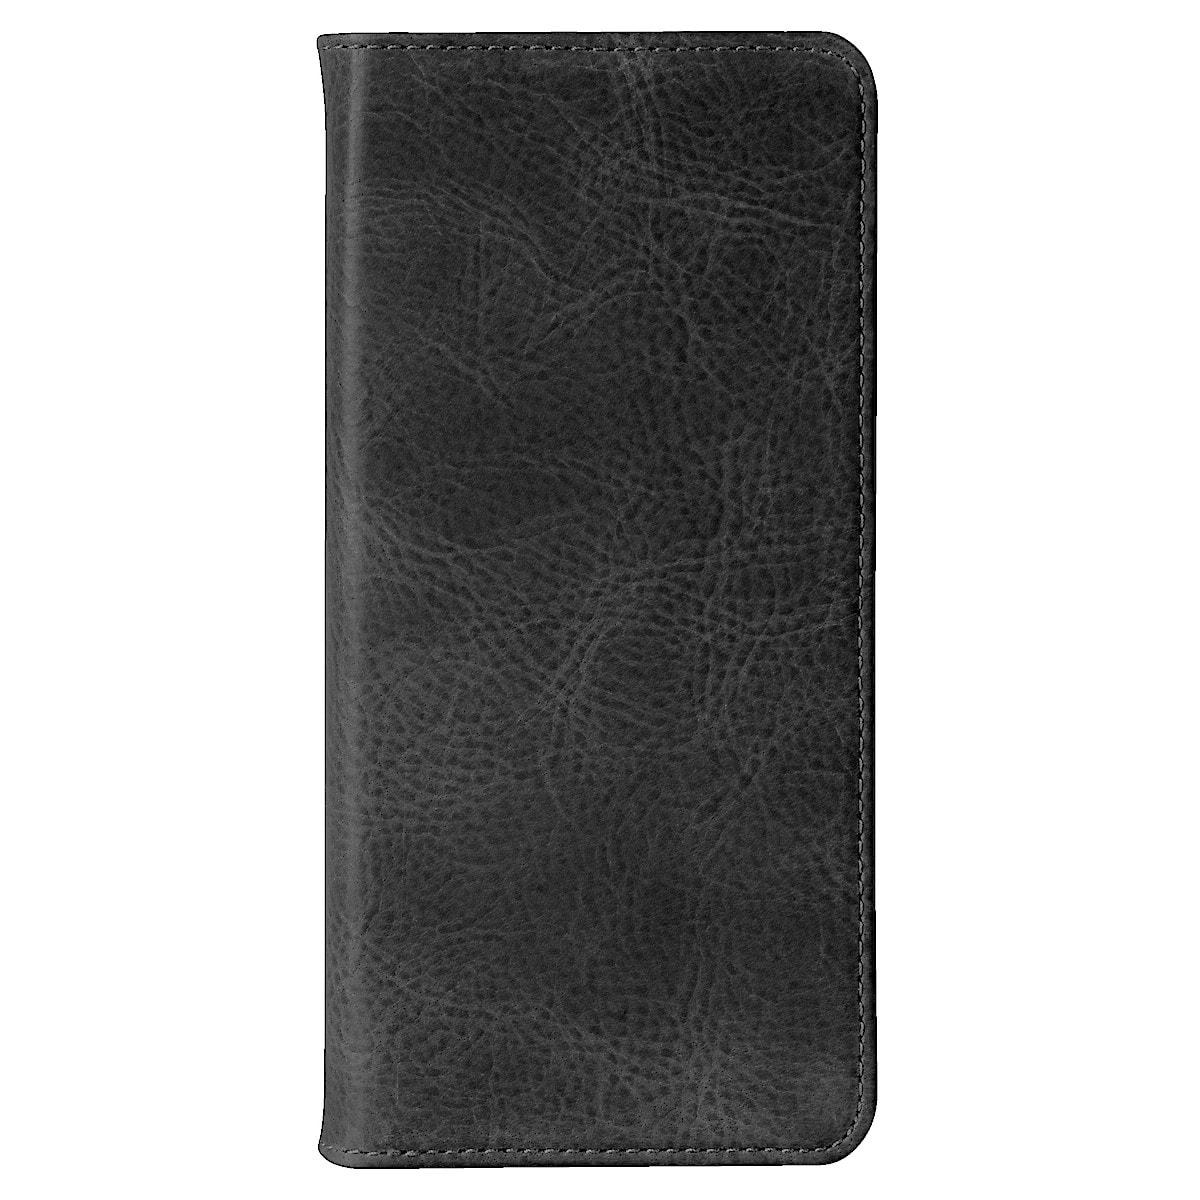 Plånboksfodral för Huawei P30 Pro, Krusell Sunne FolioWallet